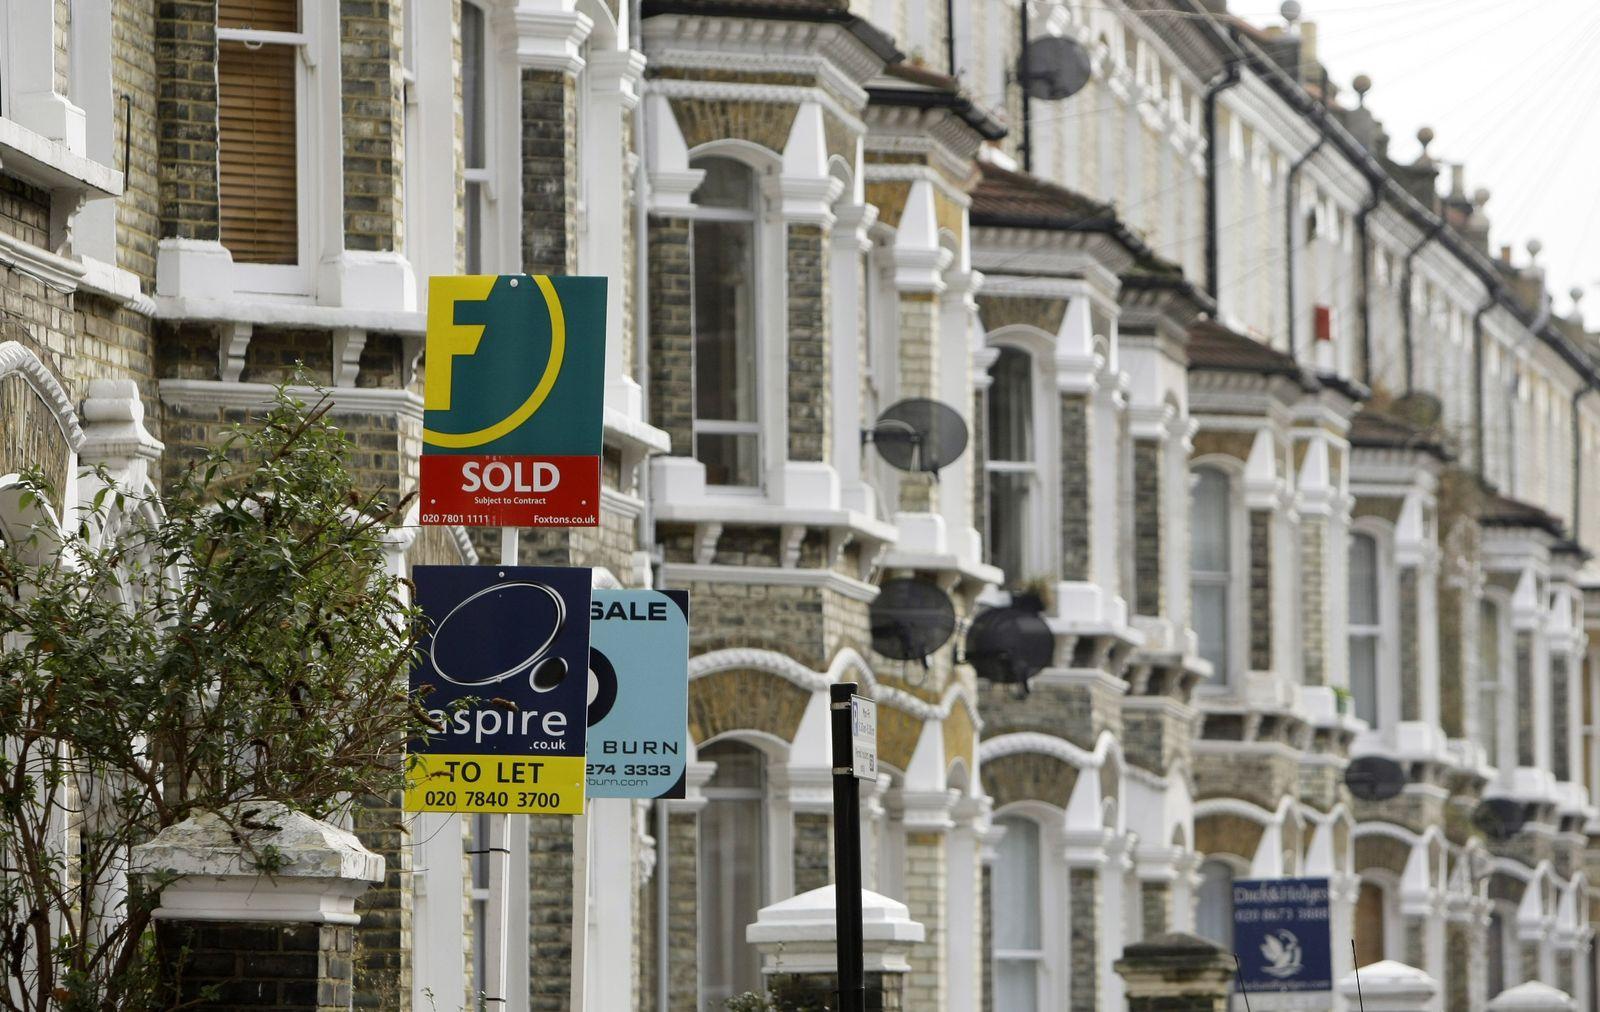 Britain Housing Sales